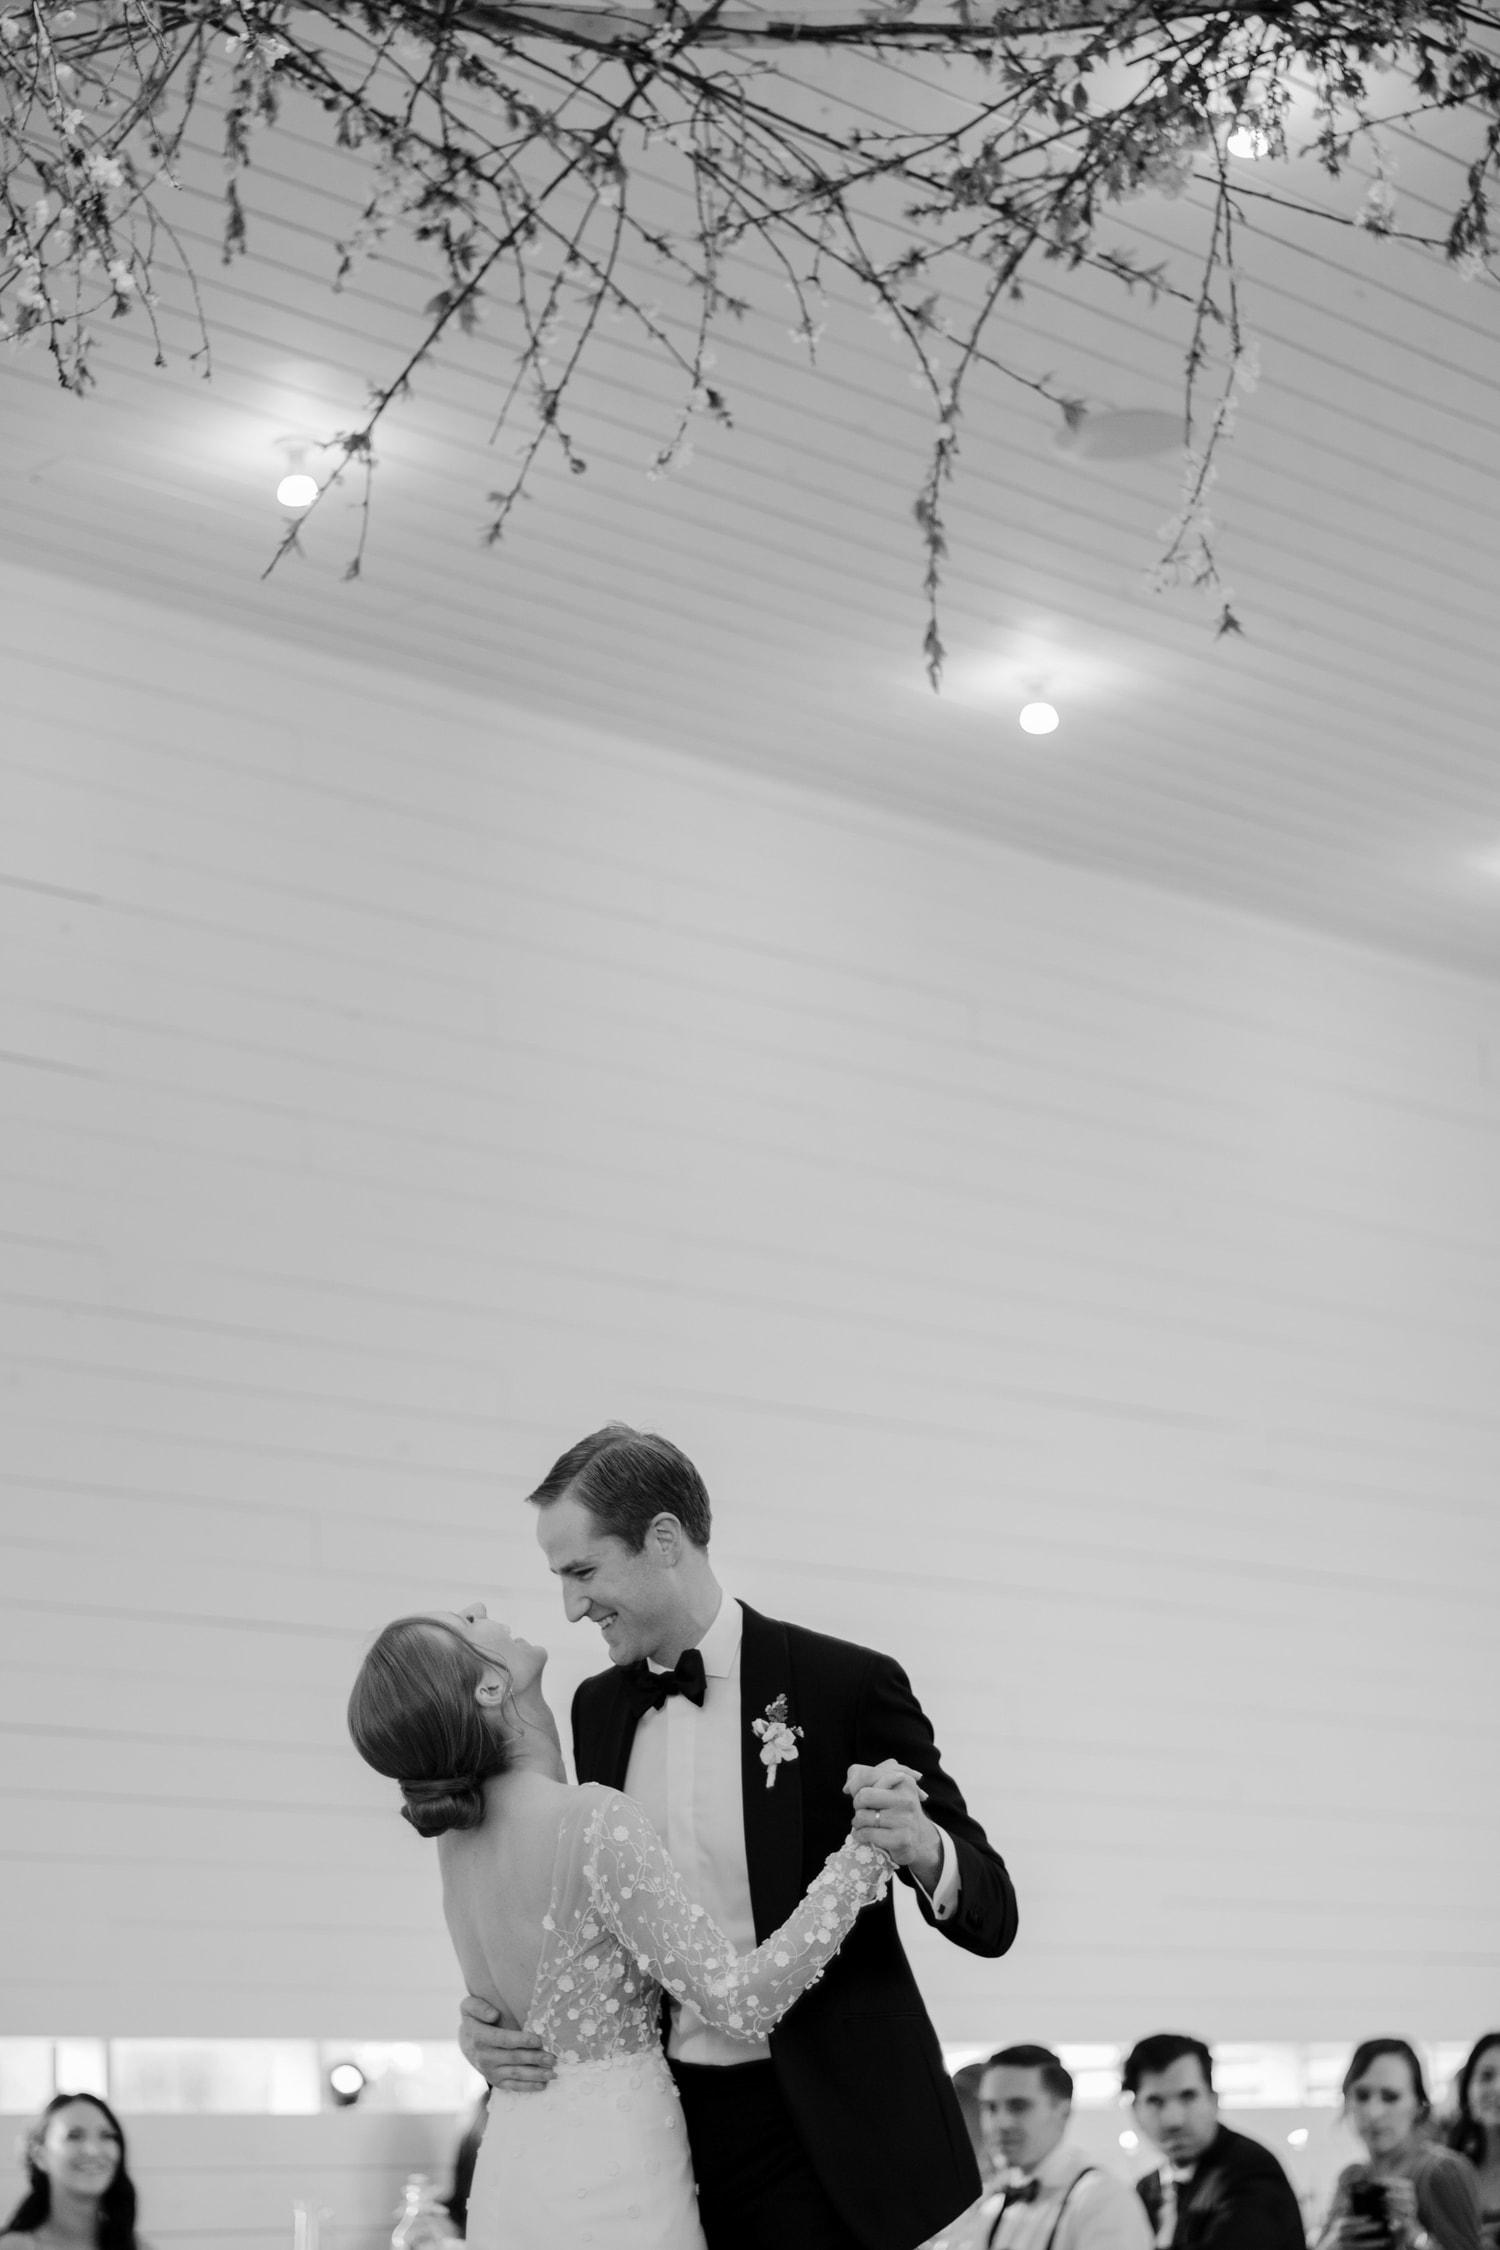 PROSPECT_HOUSE_WEDDING_AUSTIN_TX_MATTHEW_MOORE-00745.jpg